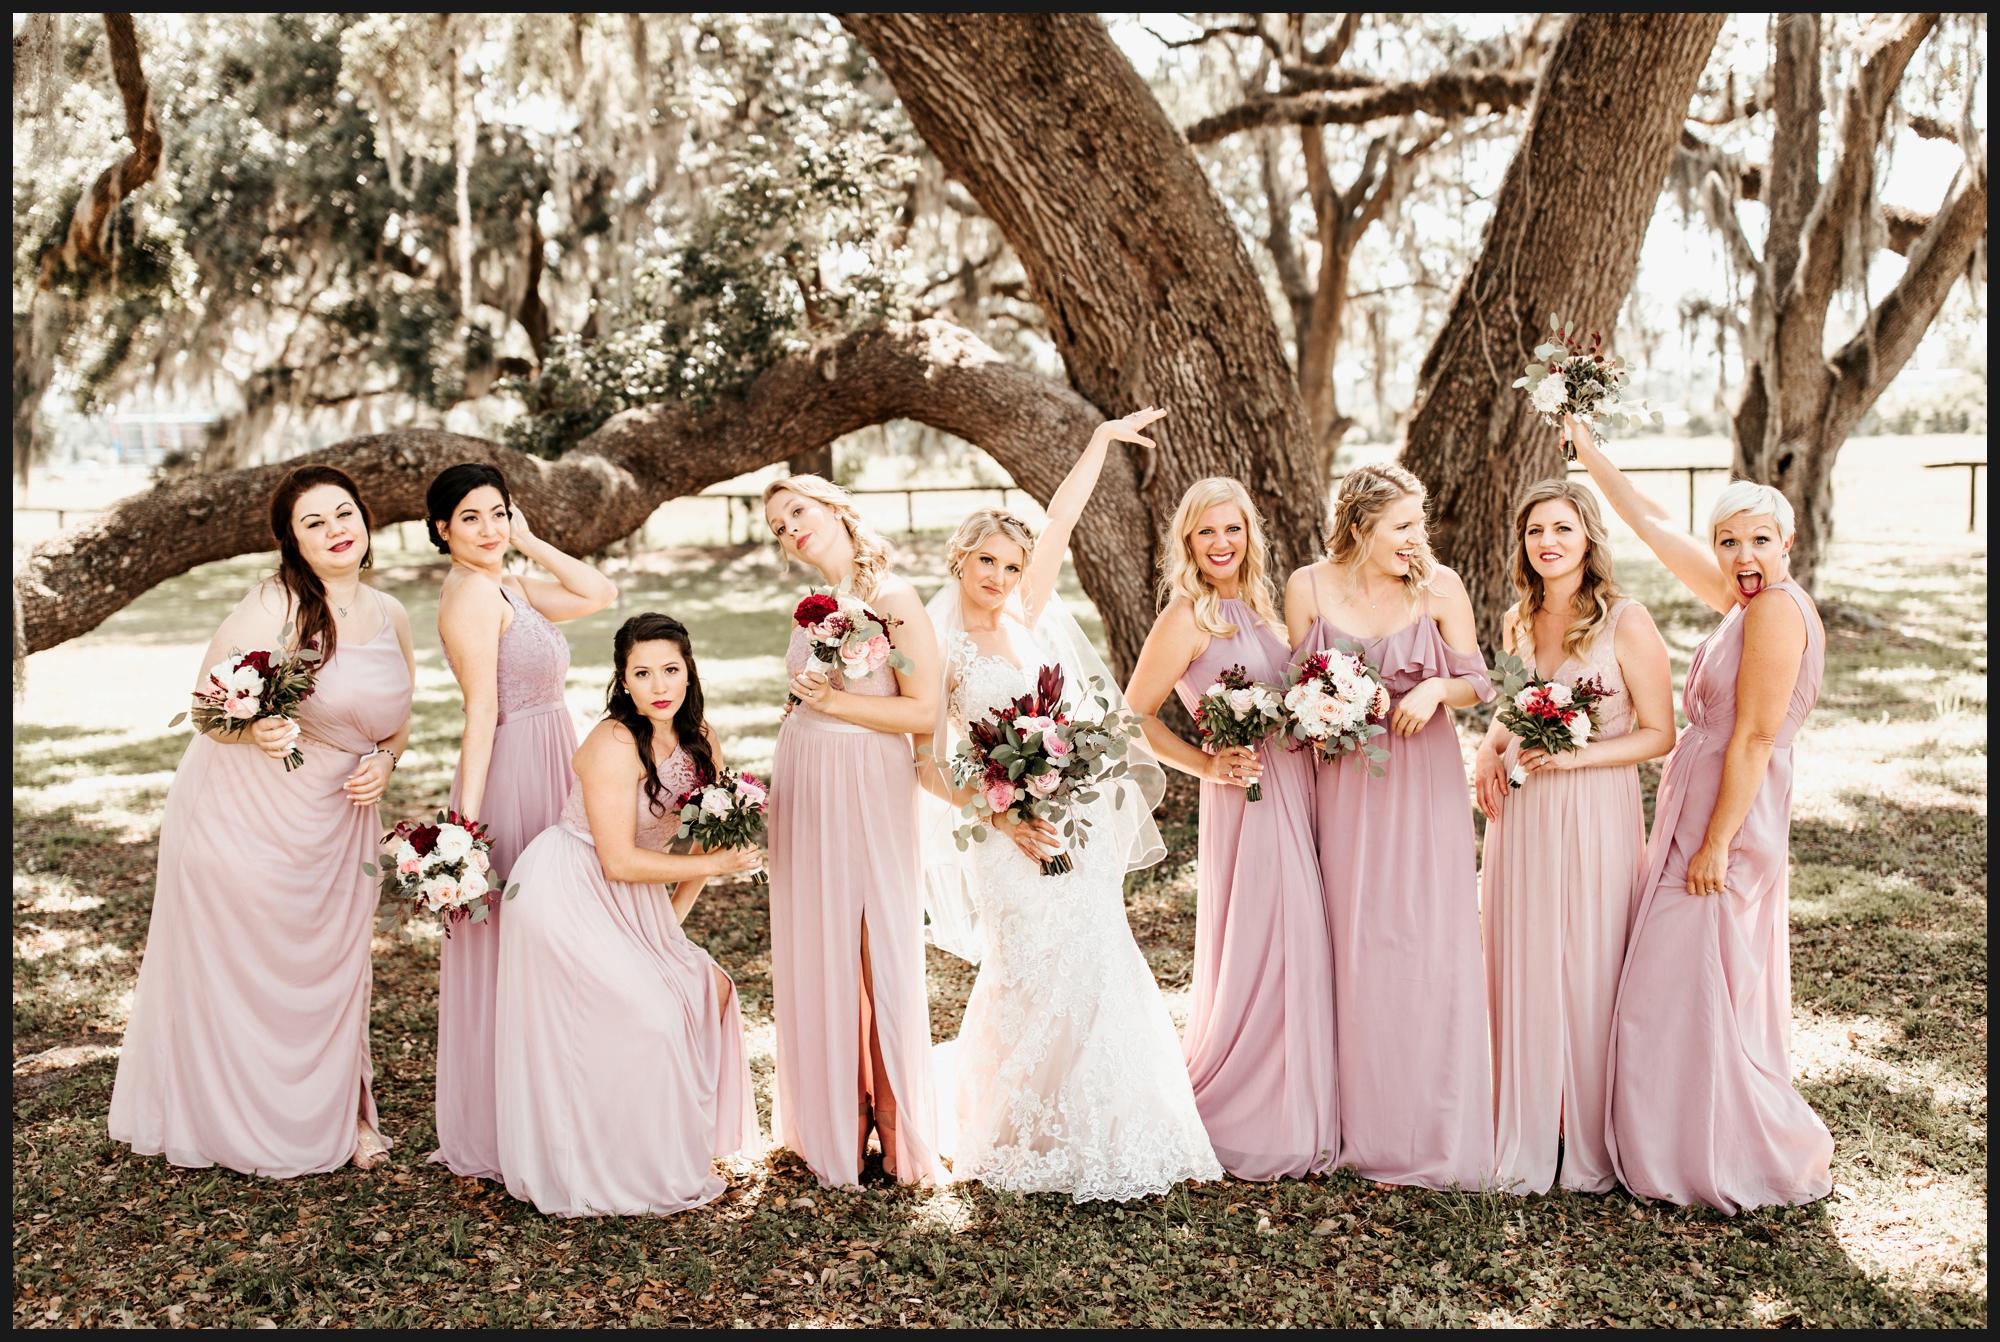 Orlando-Wedding-Photographer-destination-wedding-photographer-florida-wedding-photographer-hawaii-wedding-photographer_0583.jpg